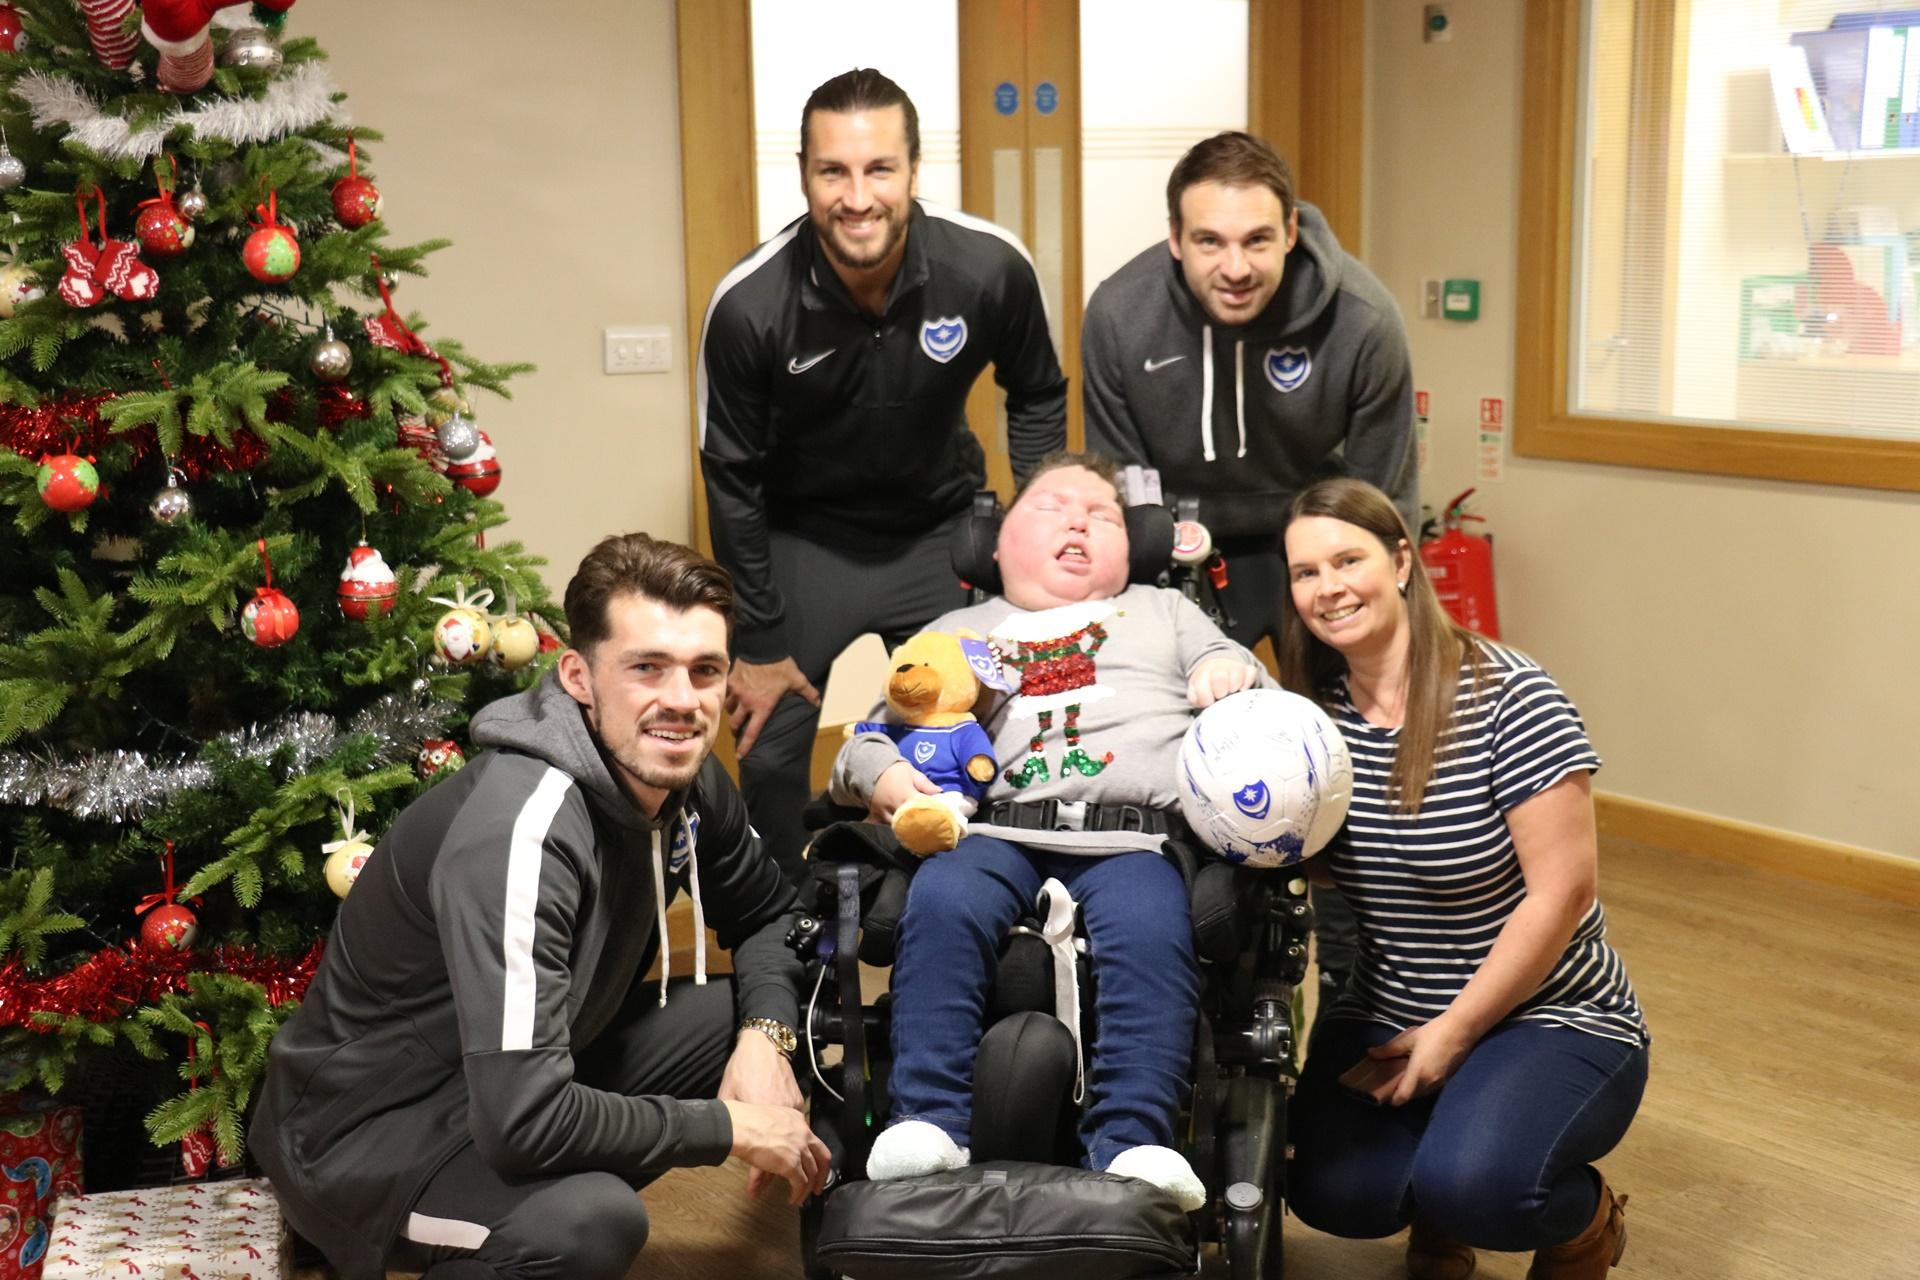 Pompey Football Club visit NH & Jacksplace